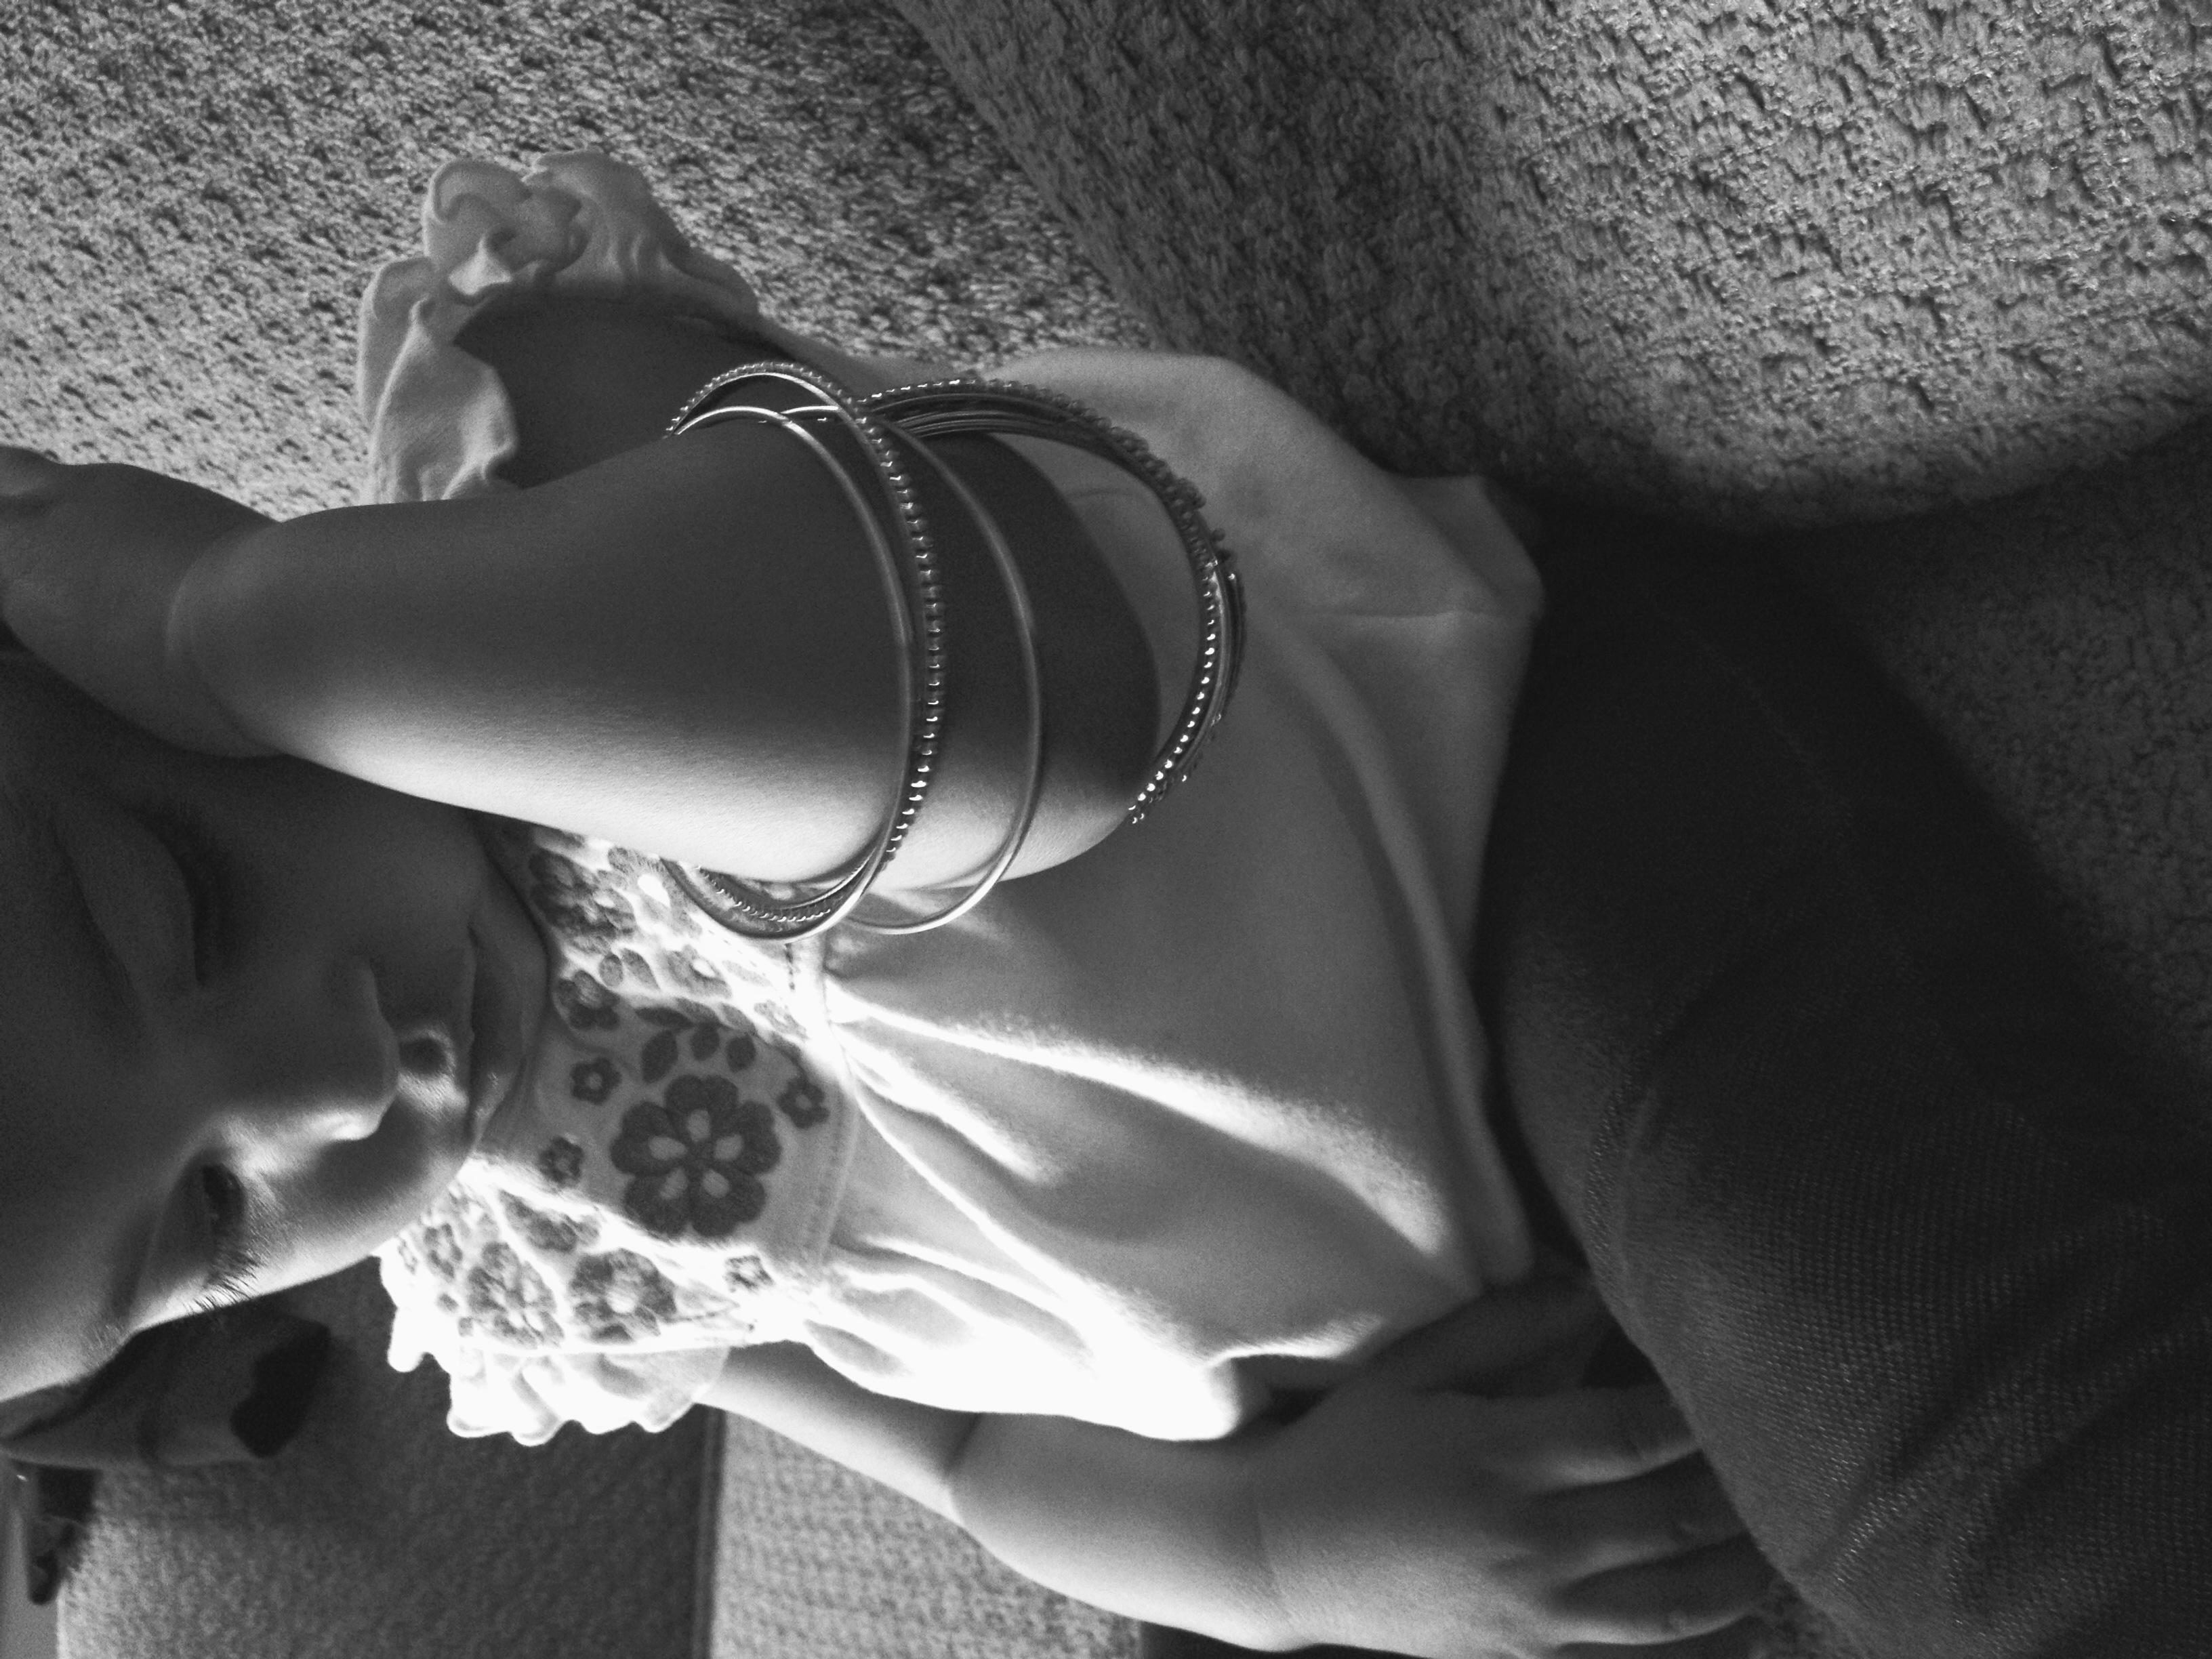 My little girly girl